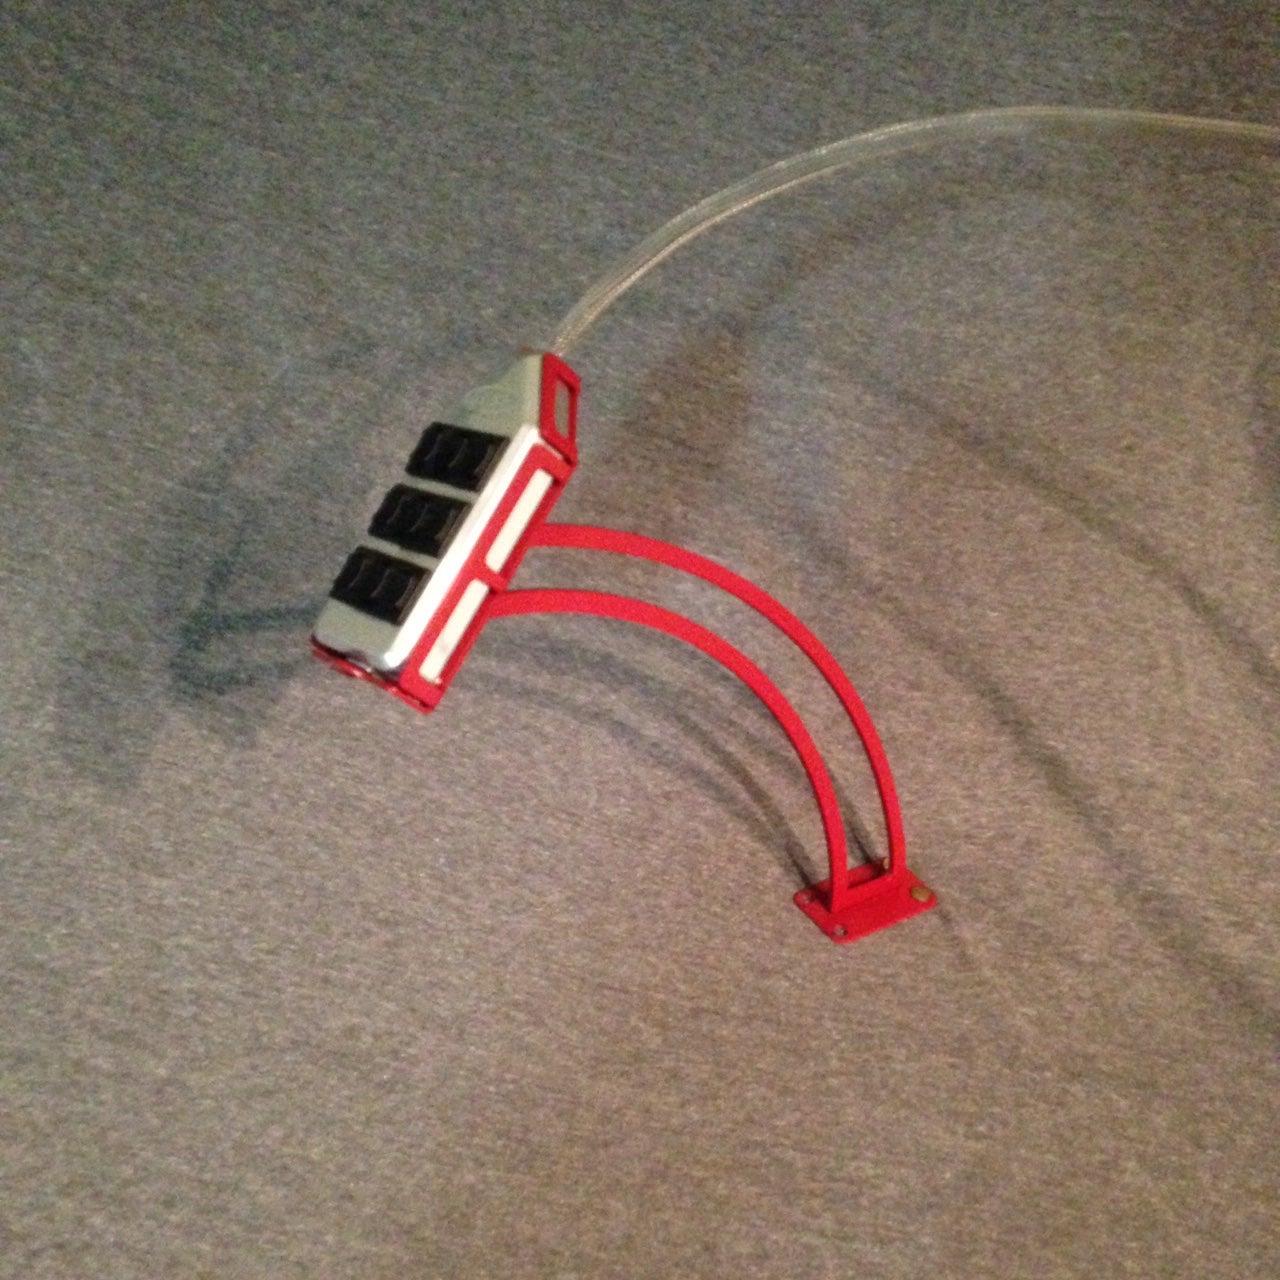 Avs switch box mount pedestal winter fab online on how to wire avs switch box avs 7 switch box wiring instructions AVS Air Ride